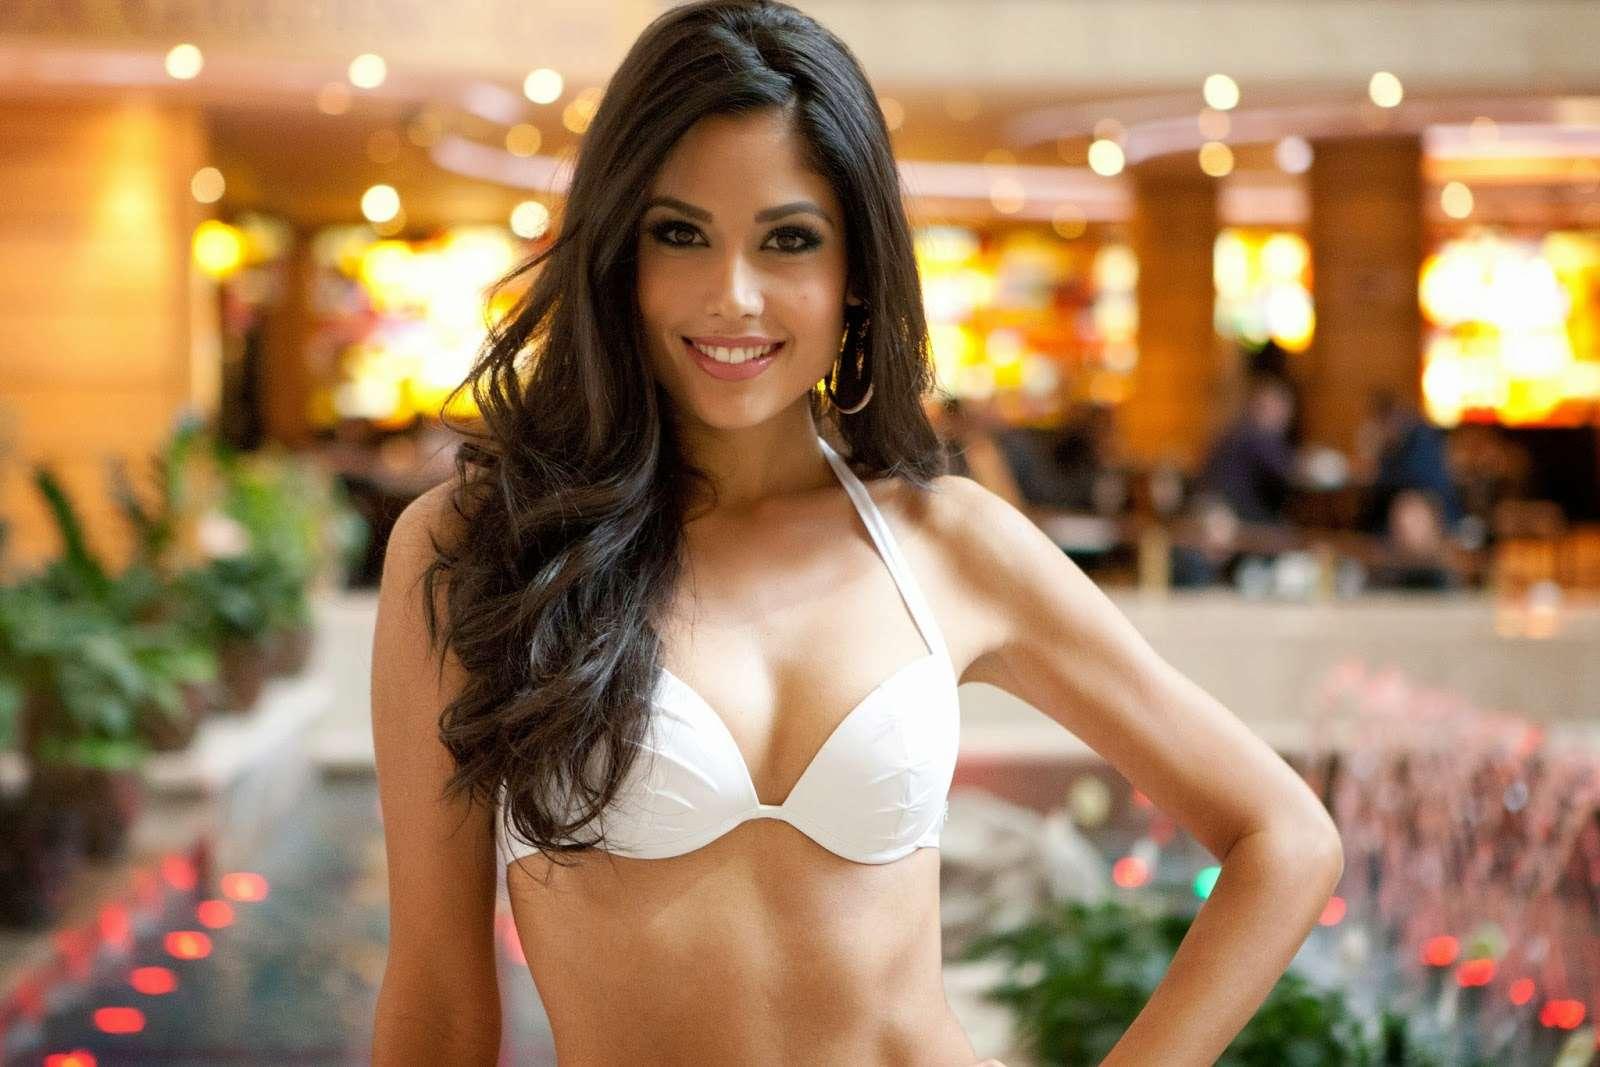 patricia yurena rodriguez, miss espana 2008/2013, 1st runner-up de miss universe 2013. - Página 5 Uni20112